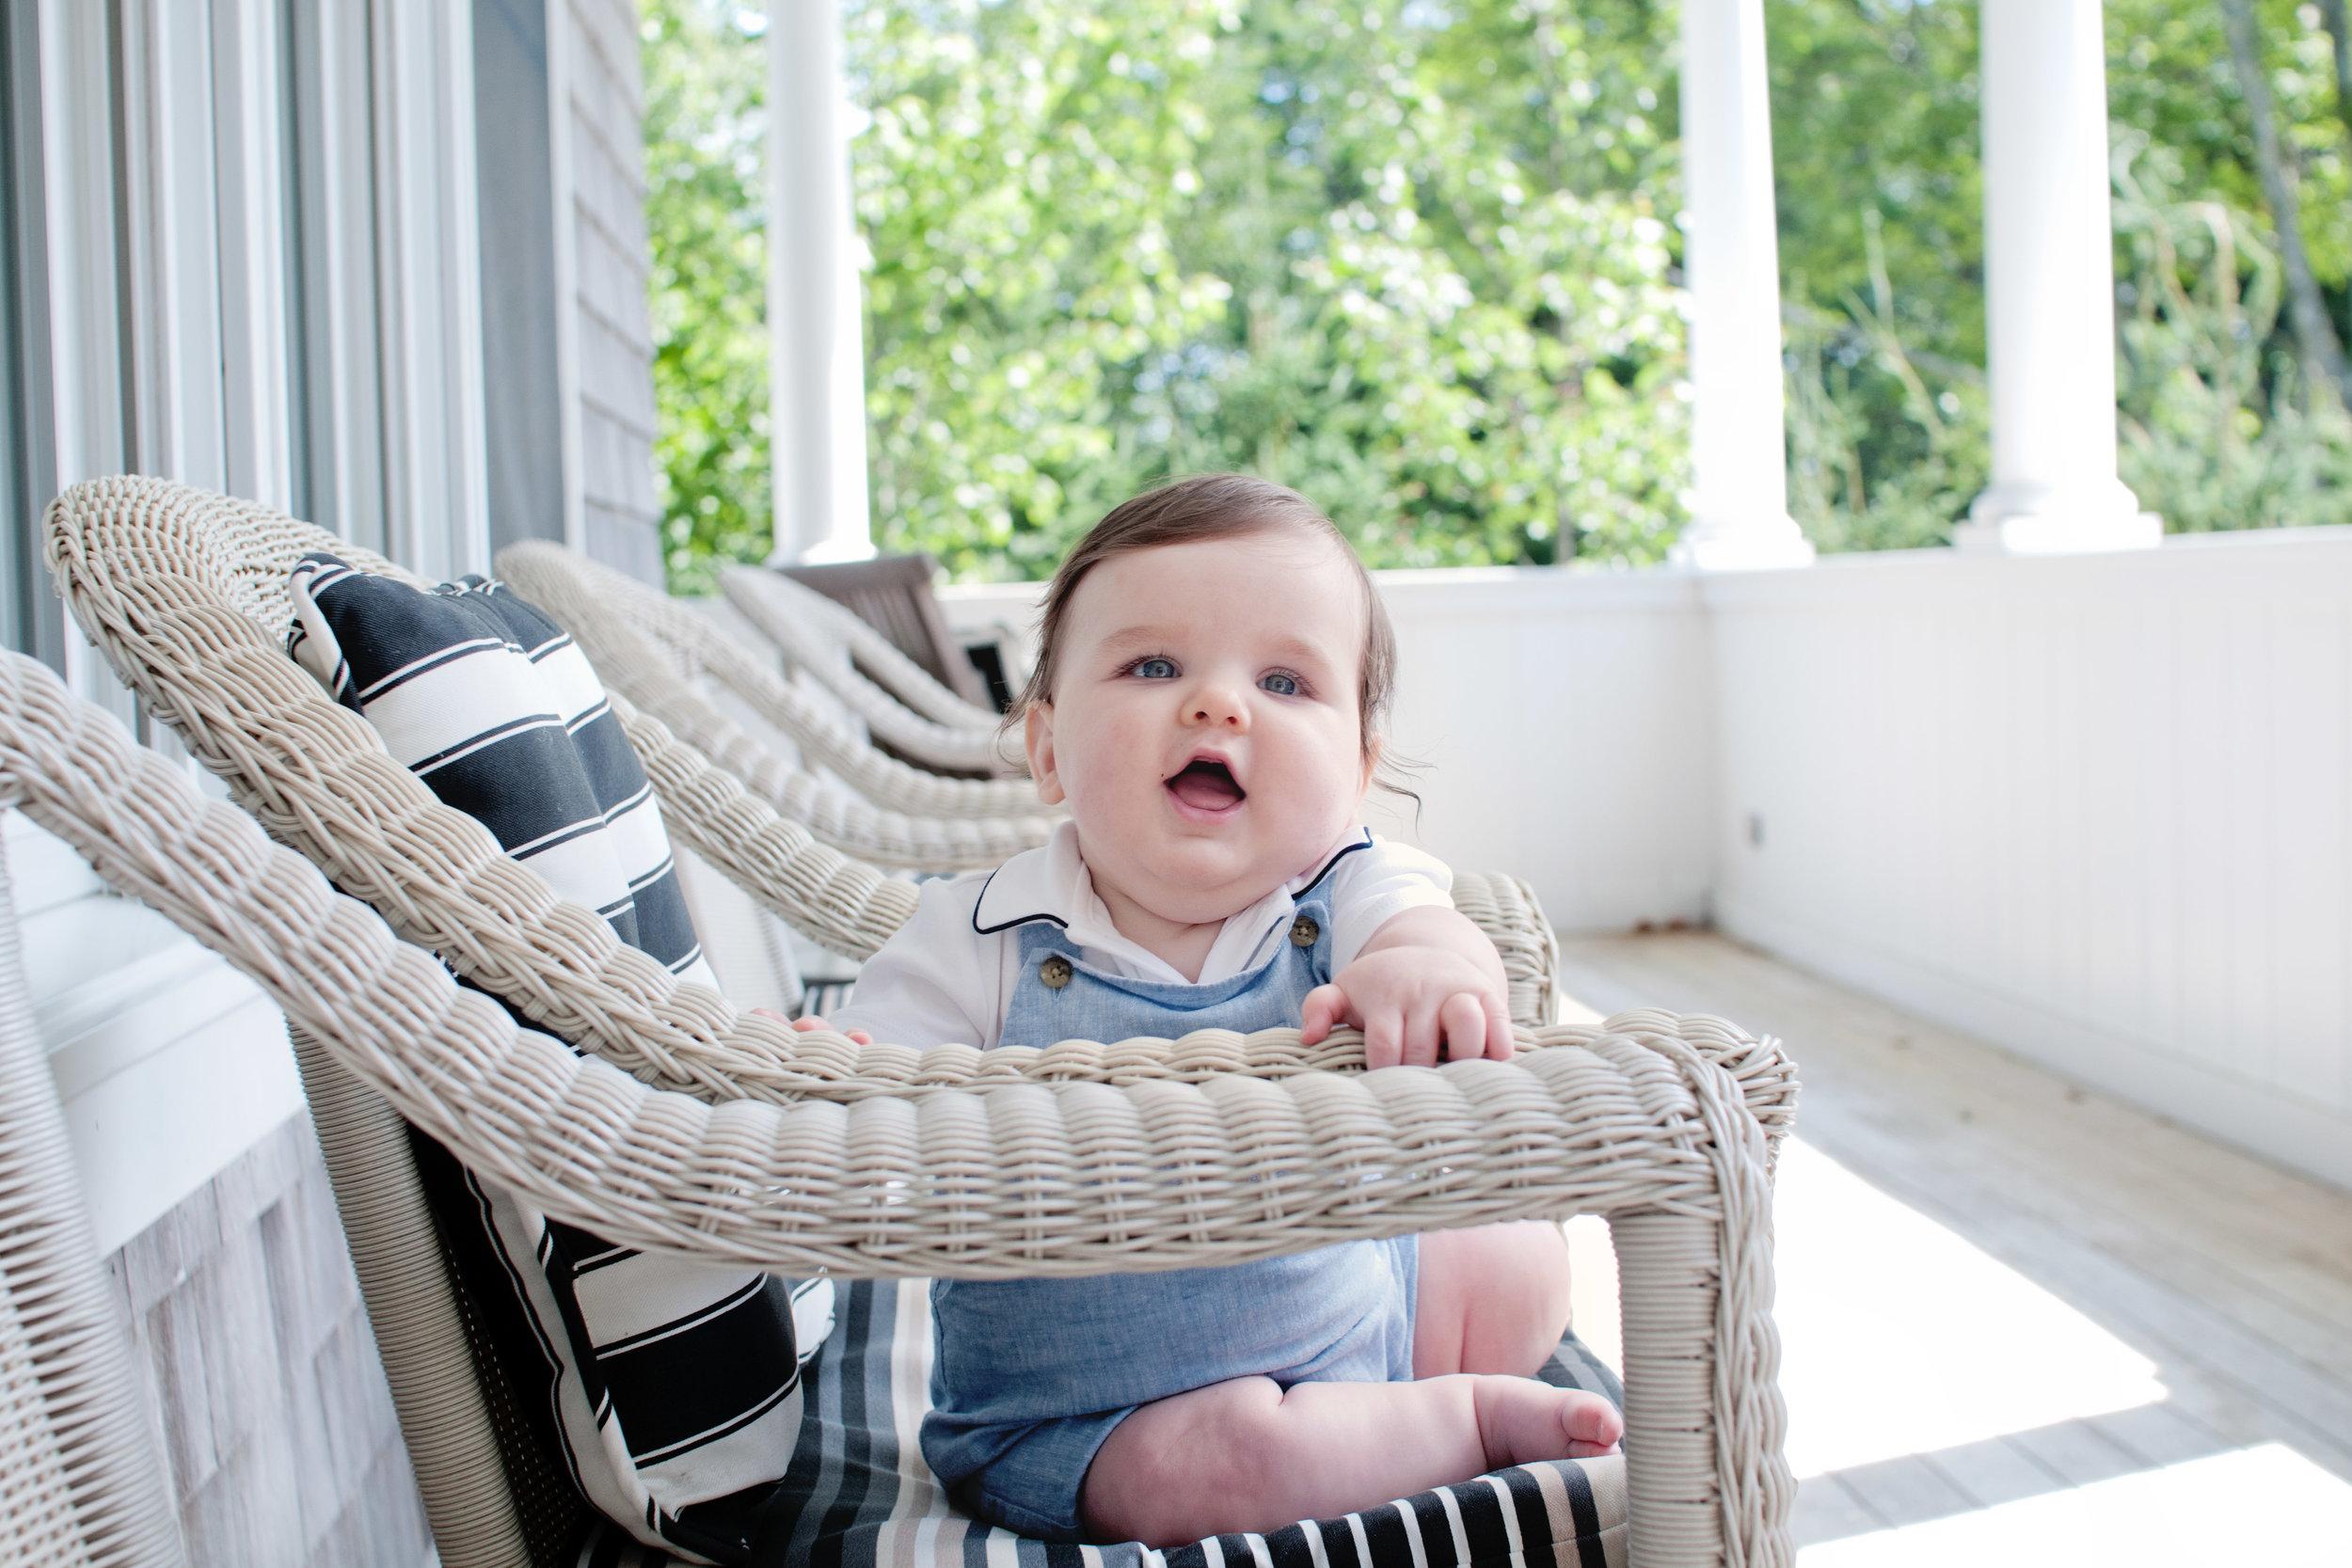 baby boy sitting in wicker chair smiling